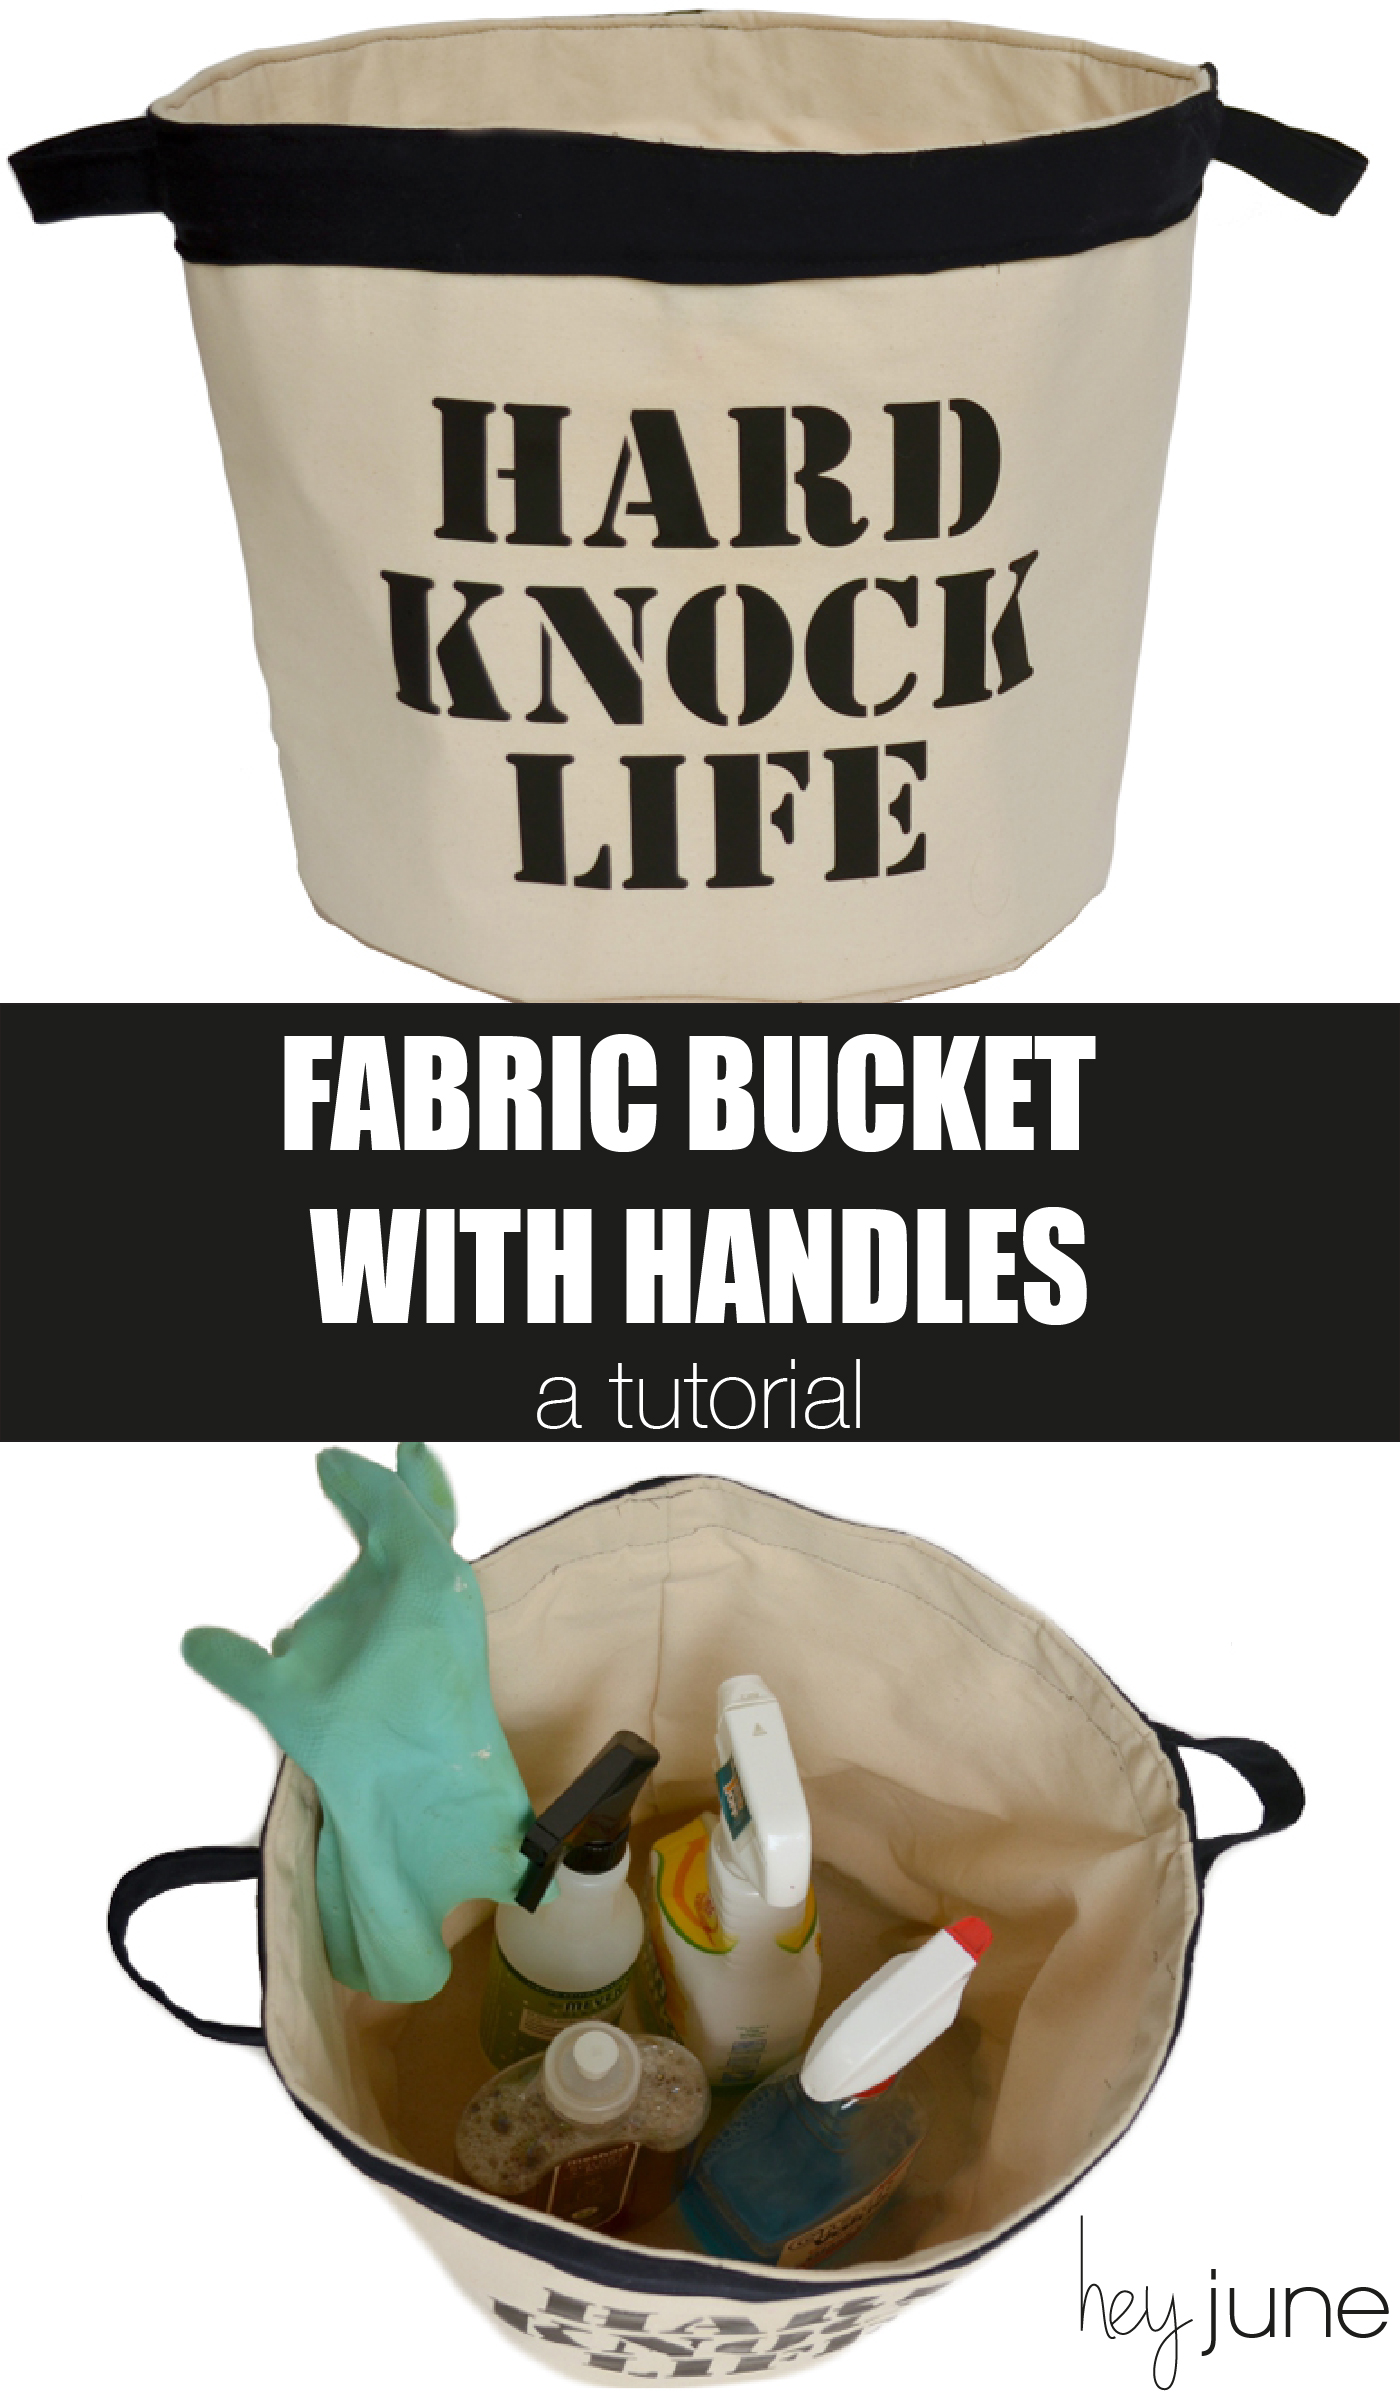 HardKnockLifeBucket2-02Hard Knock Bucket - free pattern  for a fabric bucket with handles from Hey June Handmade